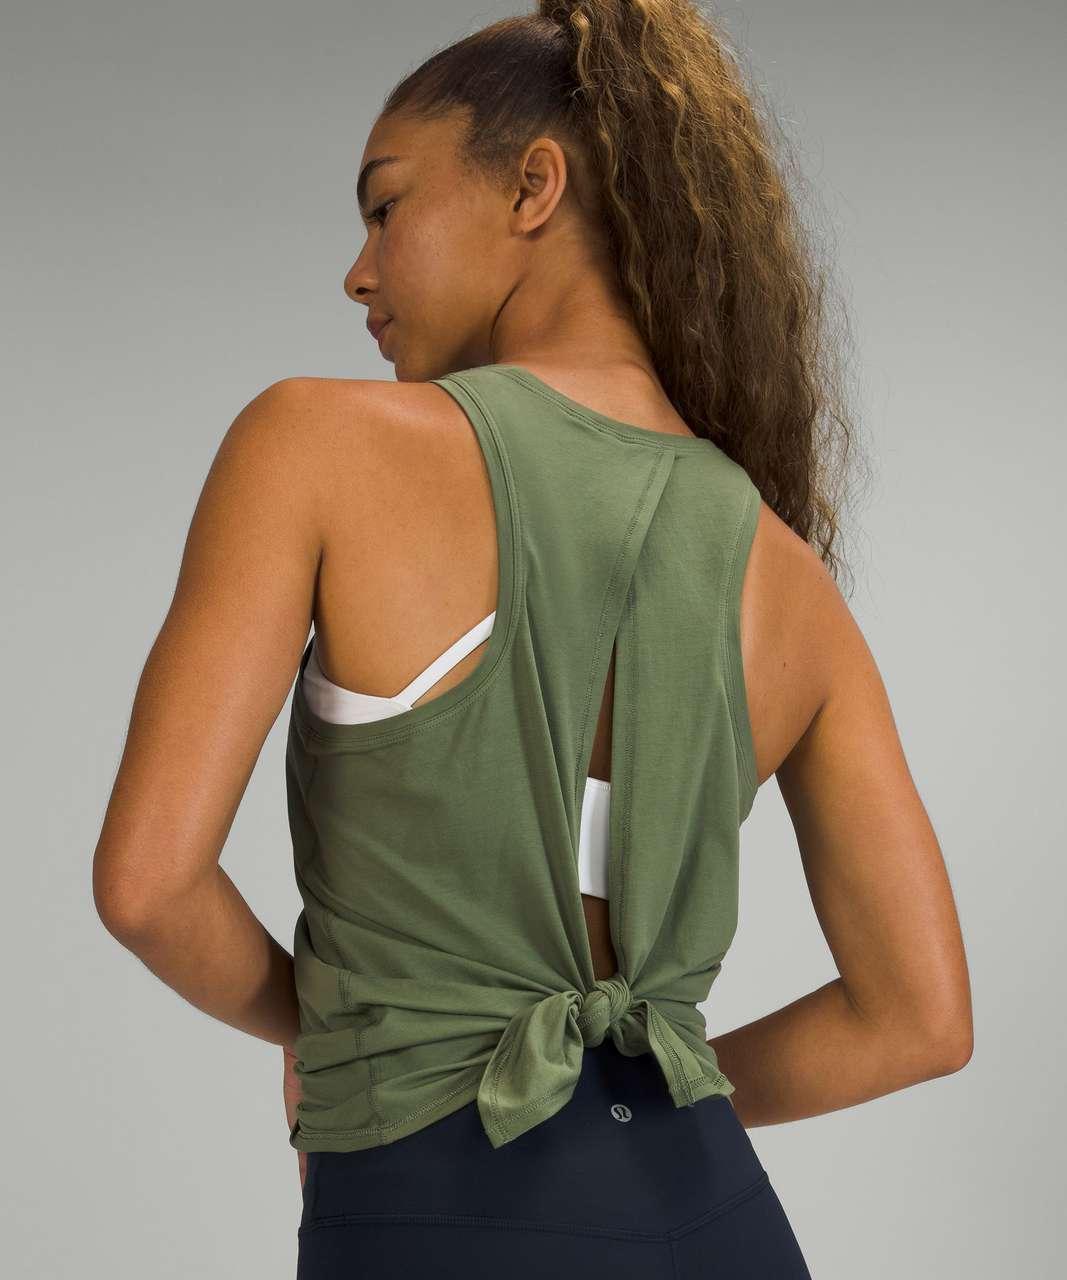 Lululemon All Tied Up Tank Top *Pima Cotton - Green Twill